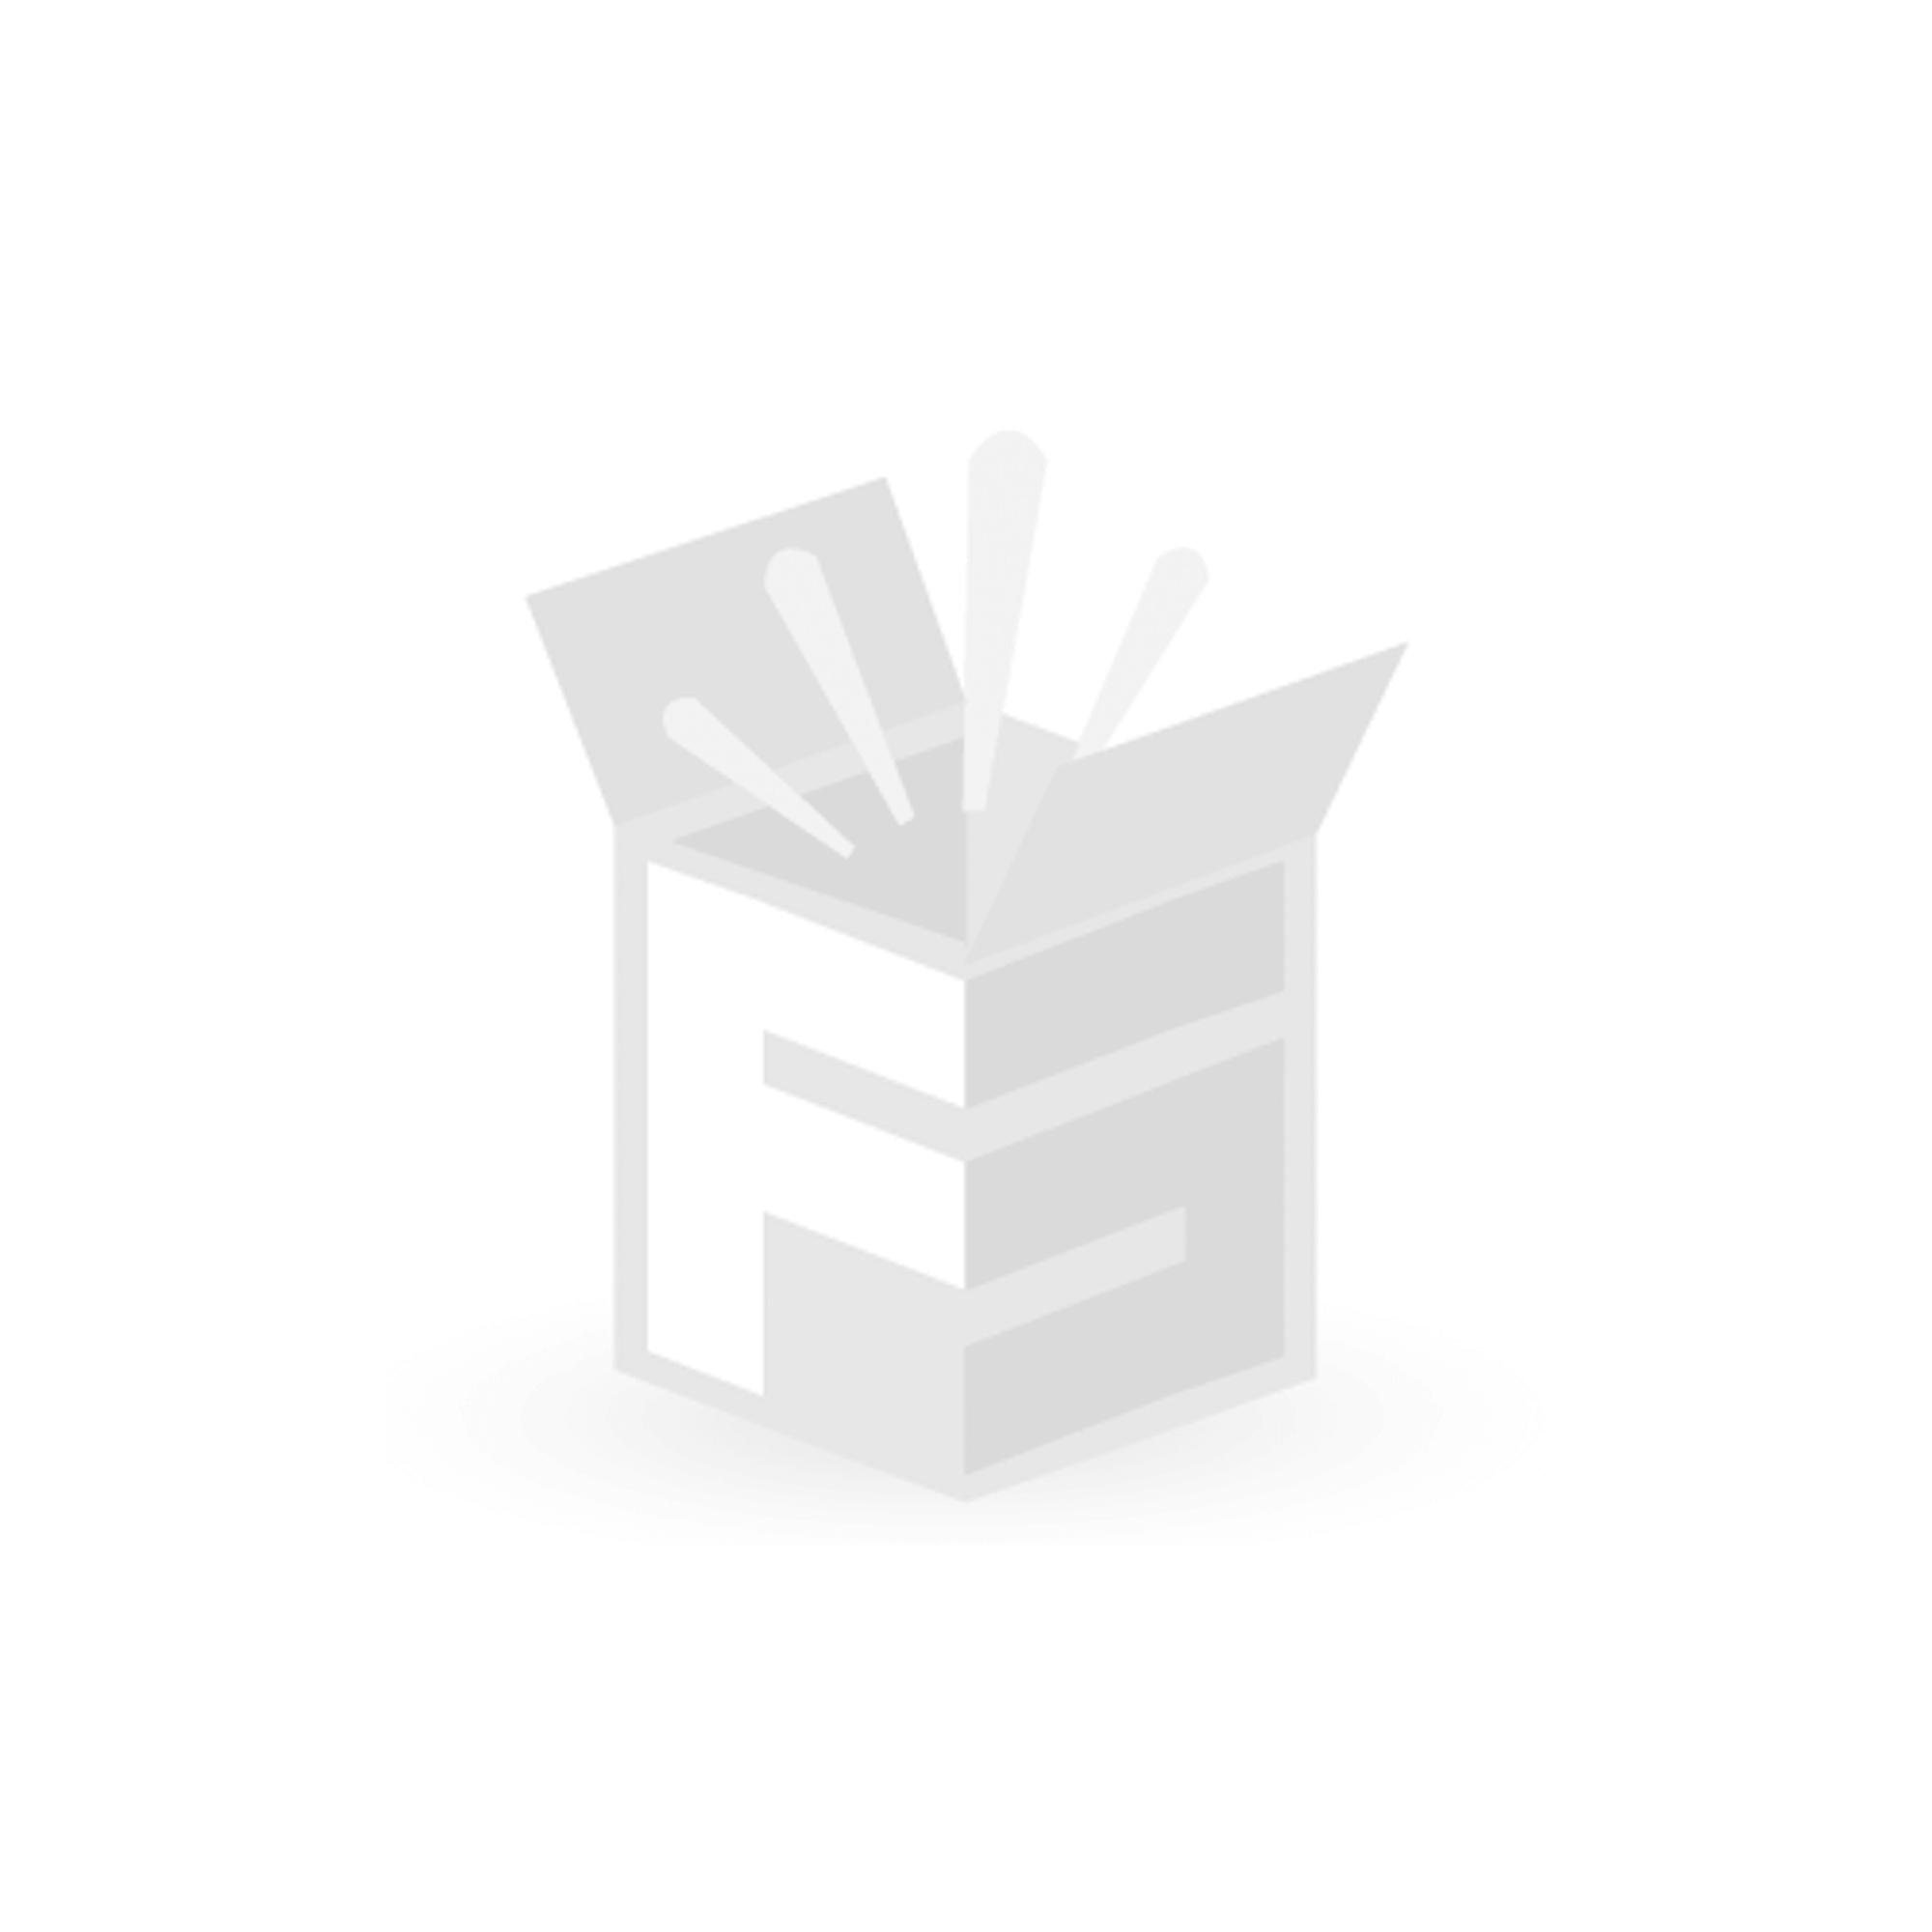 Bosch Winkelschleifer GWS 22-230 JH, inkl. Koffer + 1x Diamantscheibe